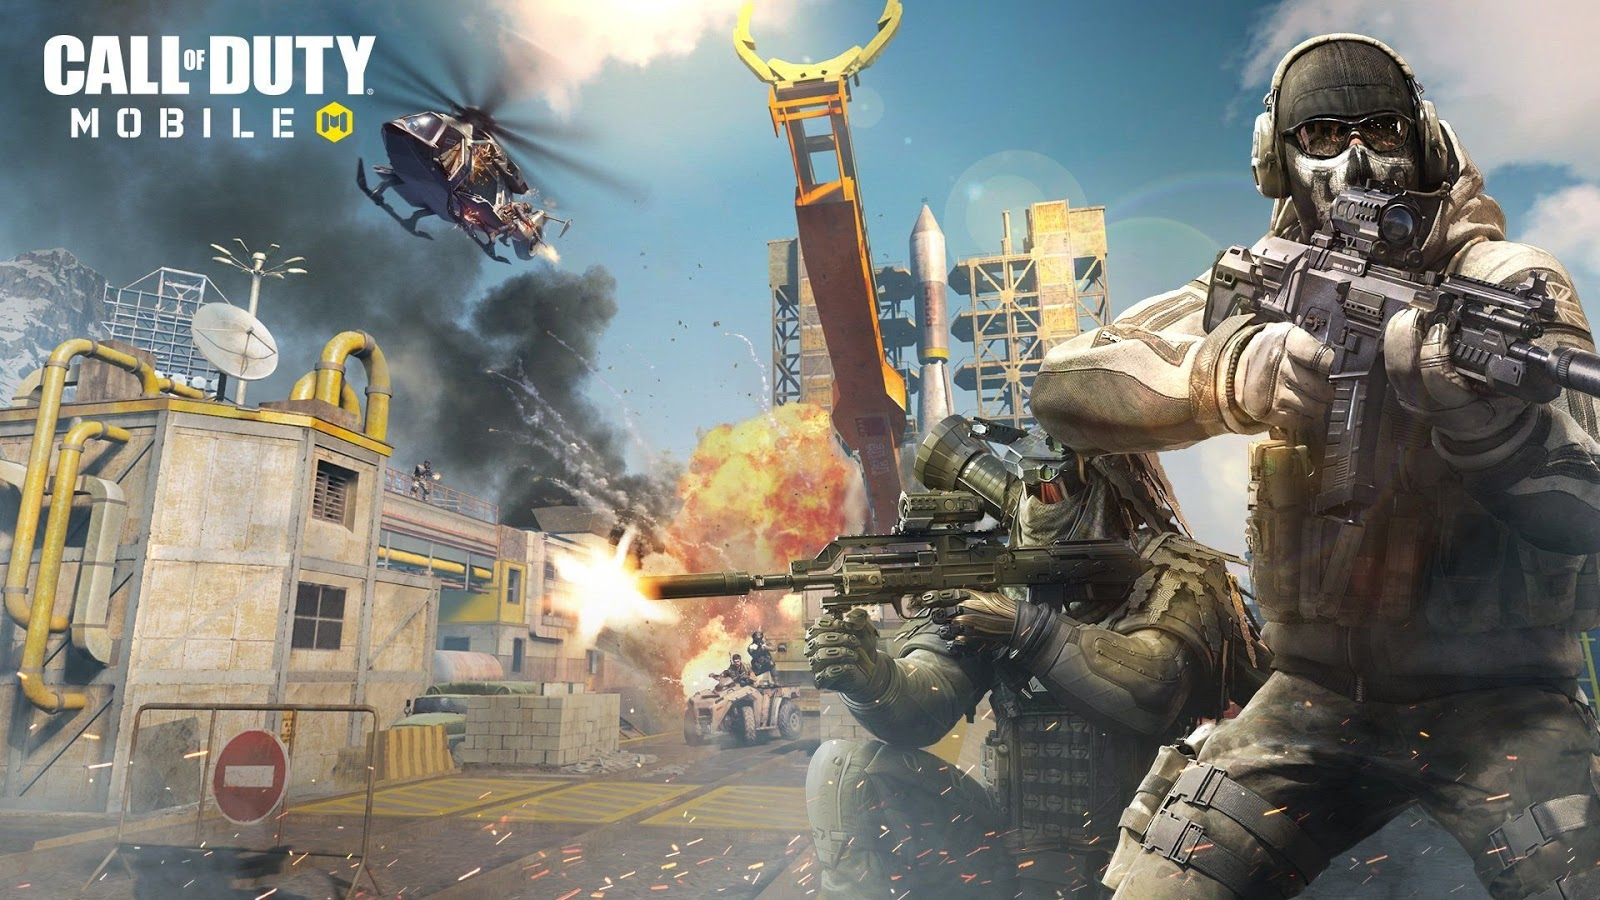 تحميل لعبة كول أوف ديوتي Call of Duty: Mobile برابط مباشر